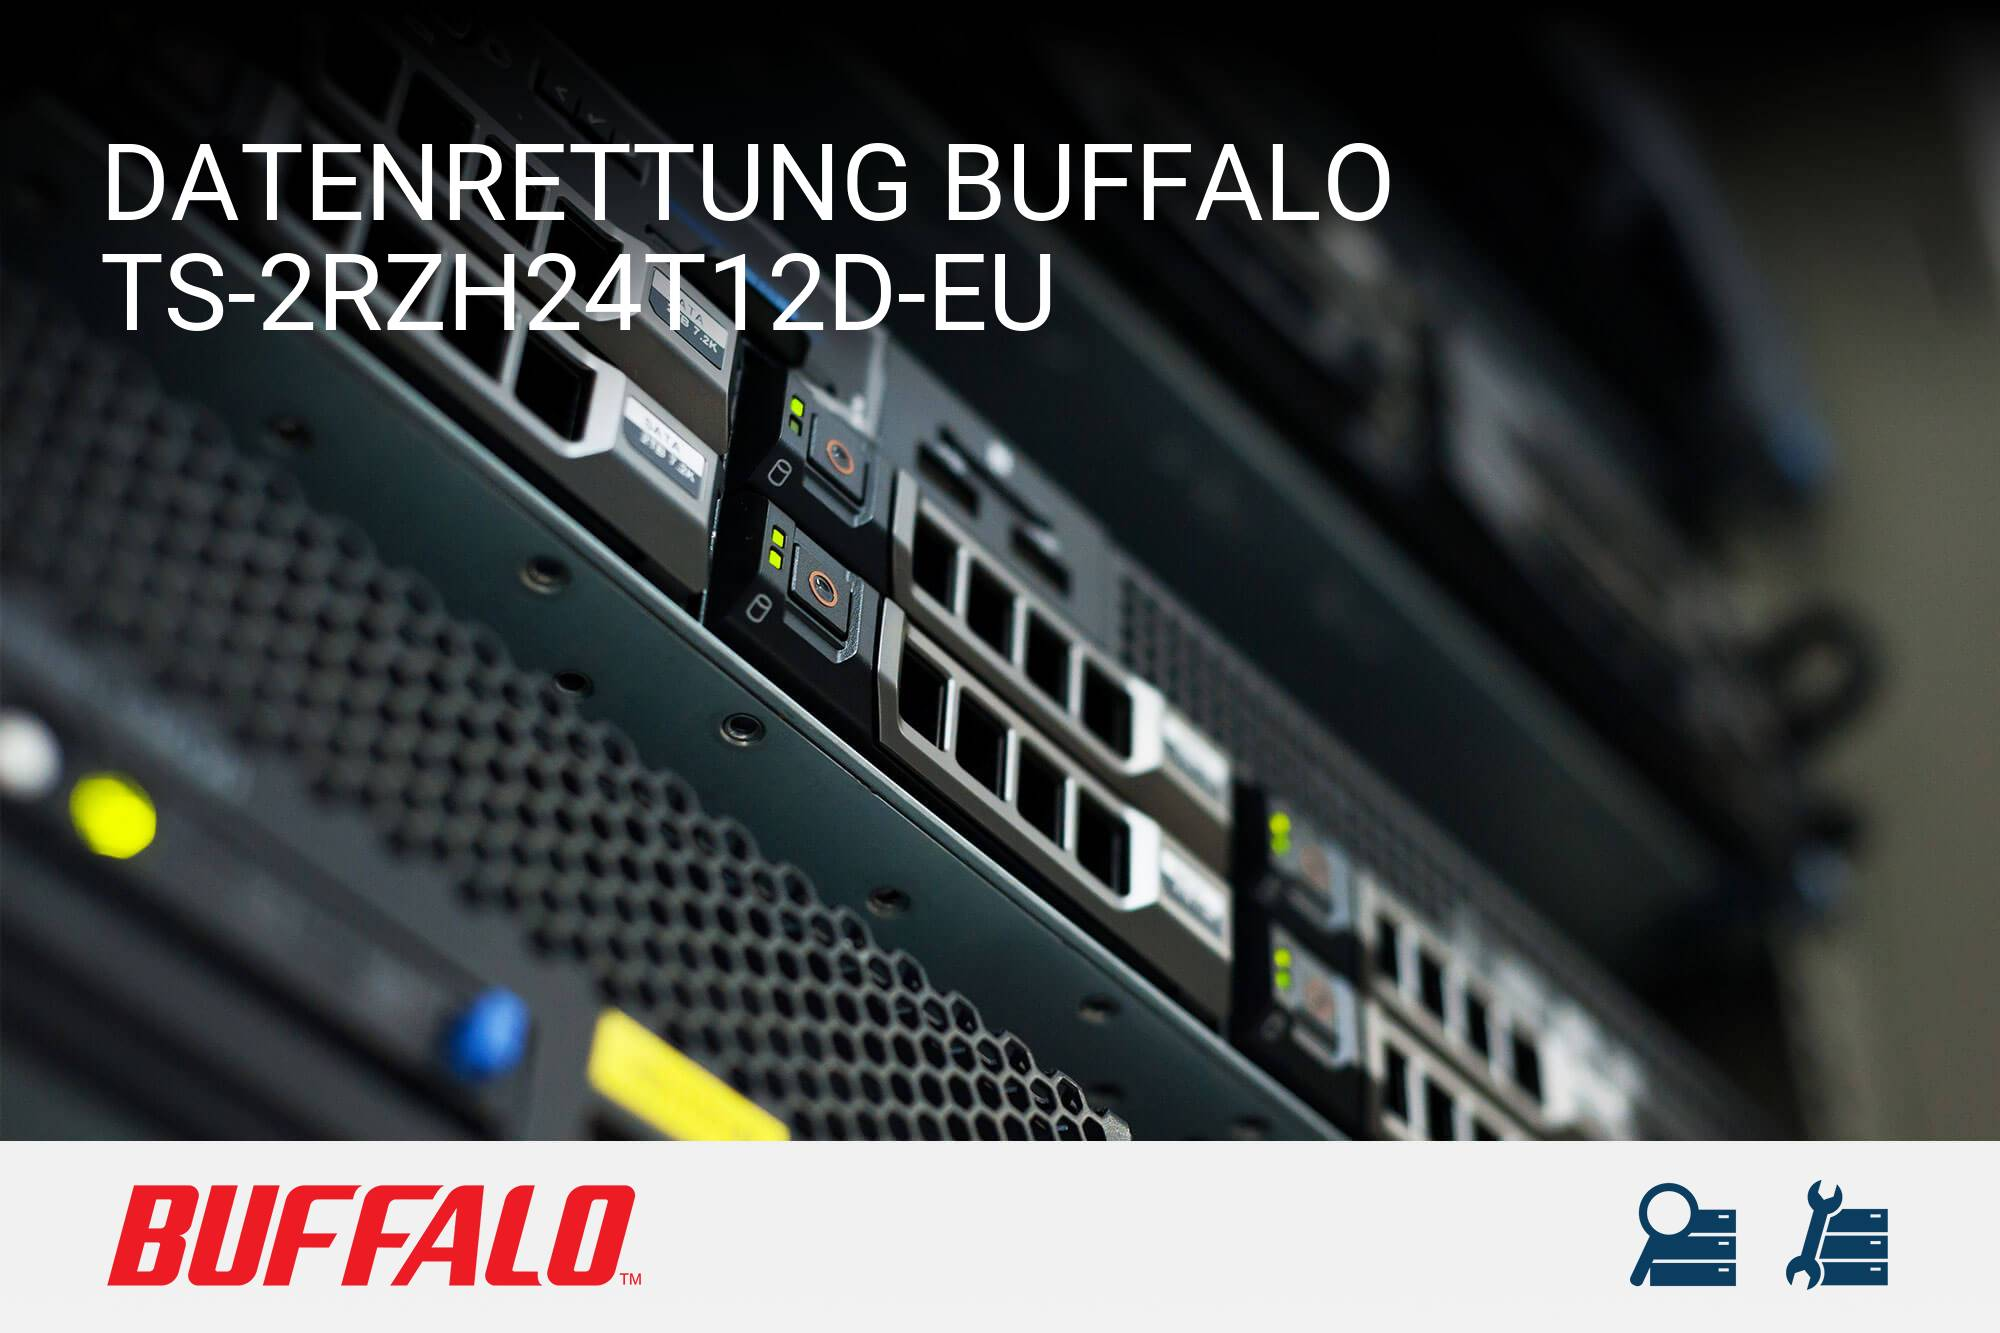 Buffalo TS-2RZH24T12D-EU